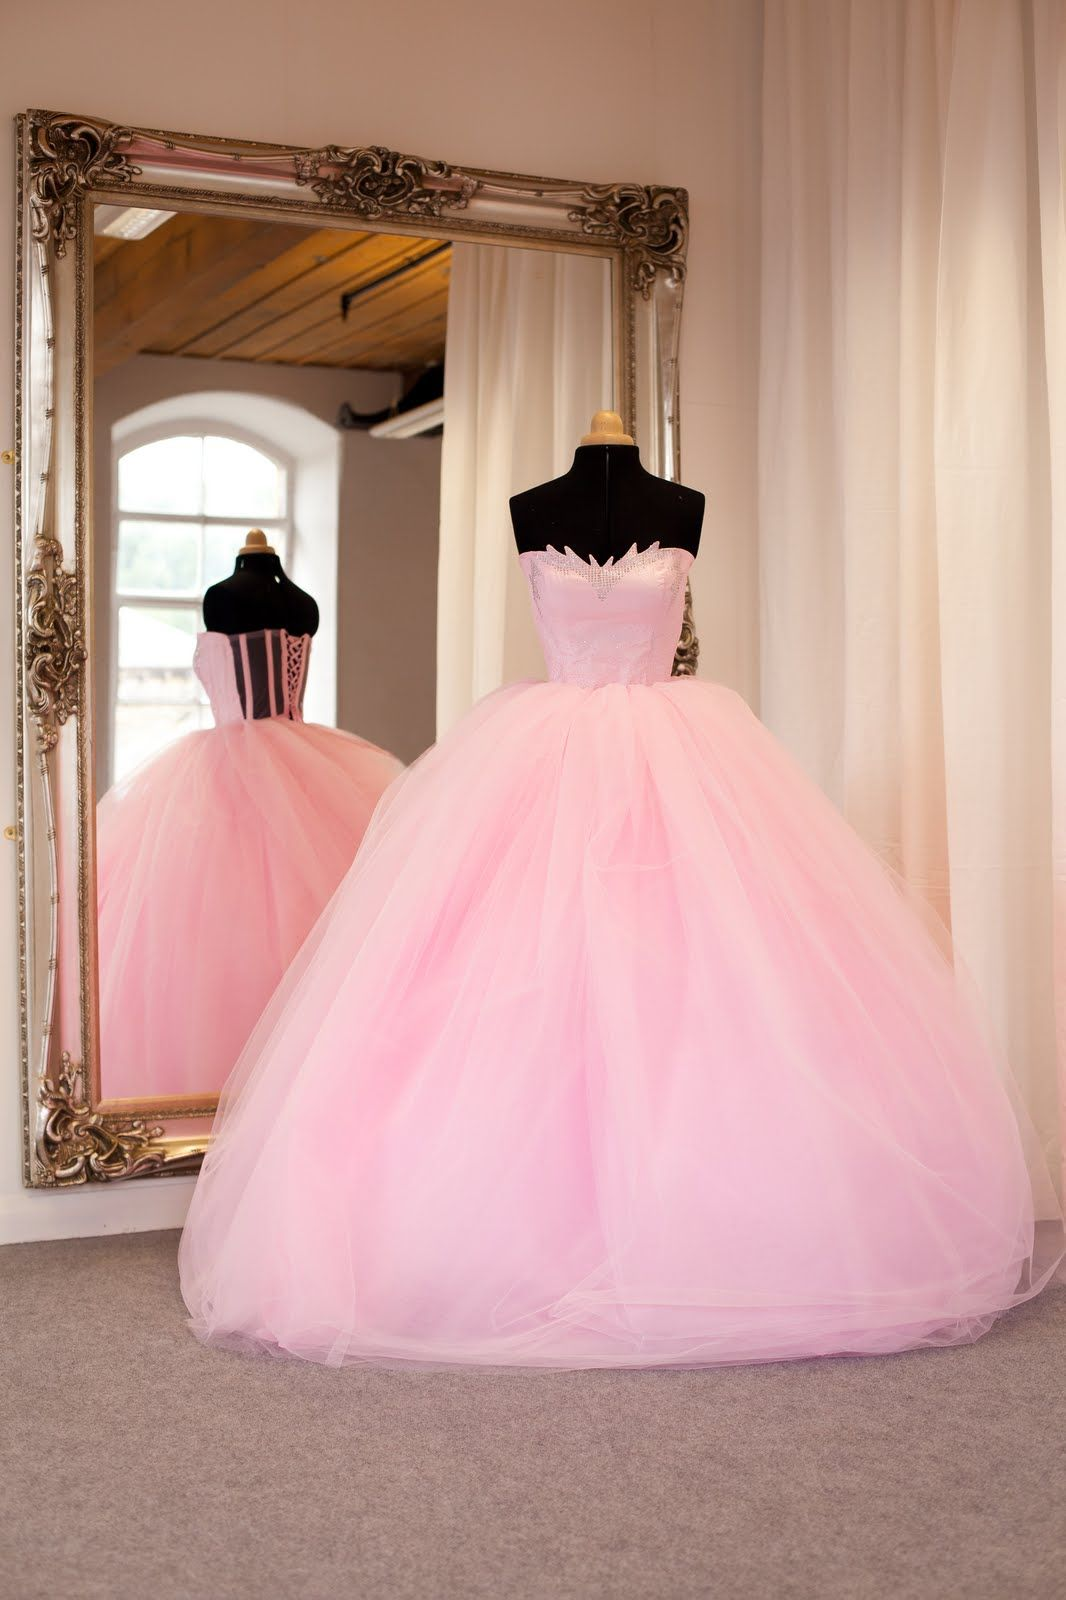 Pin de ASHLEY Rosalez en dresses | Pinterest | Vestido rosado ...